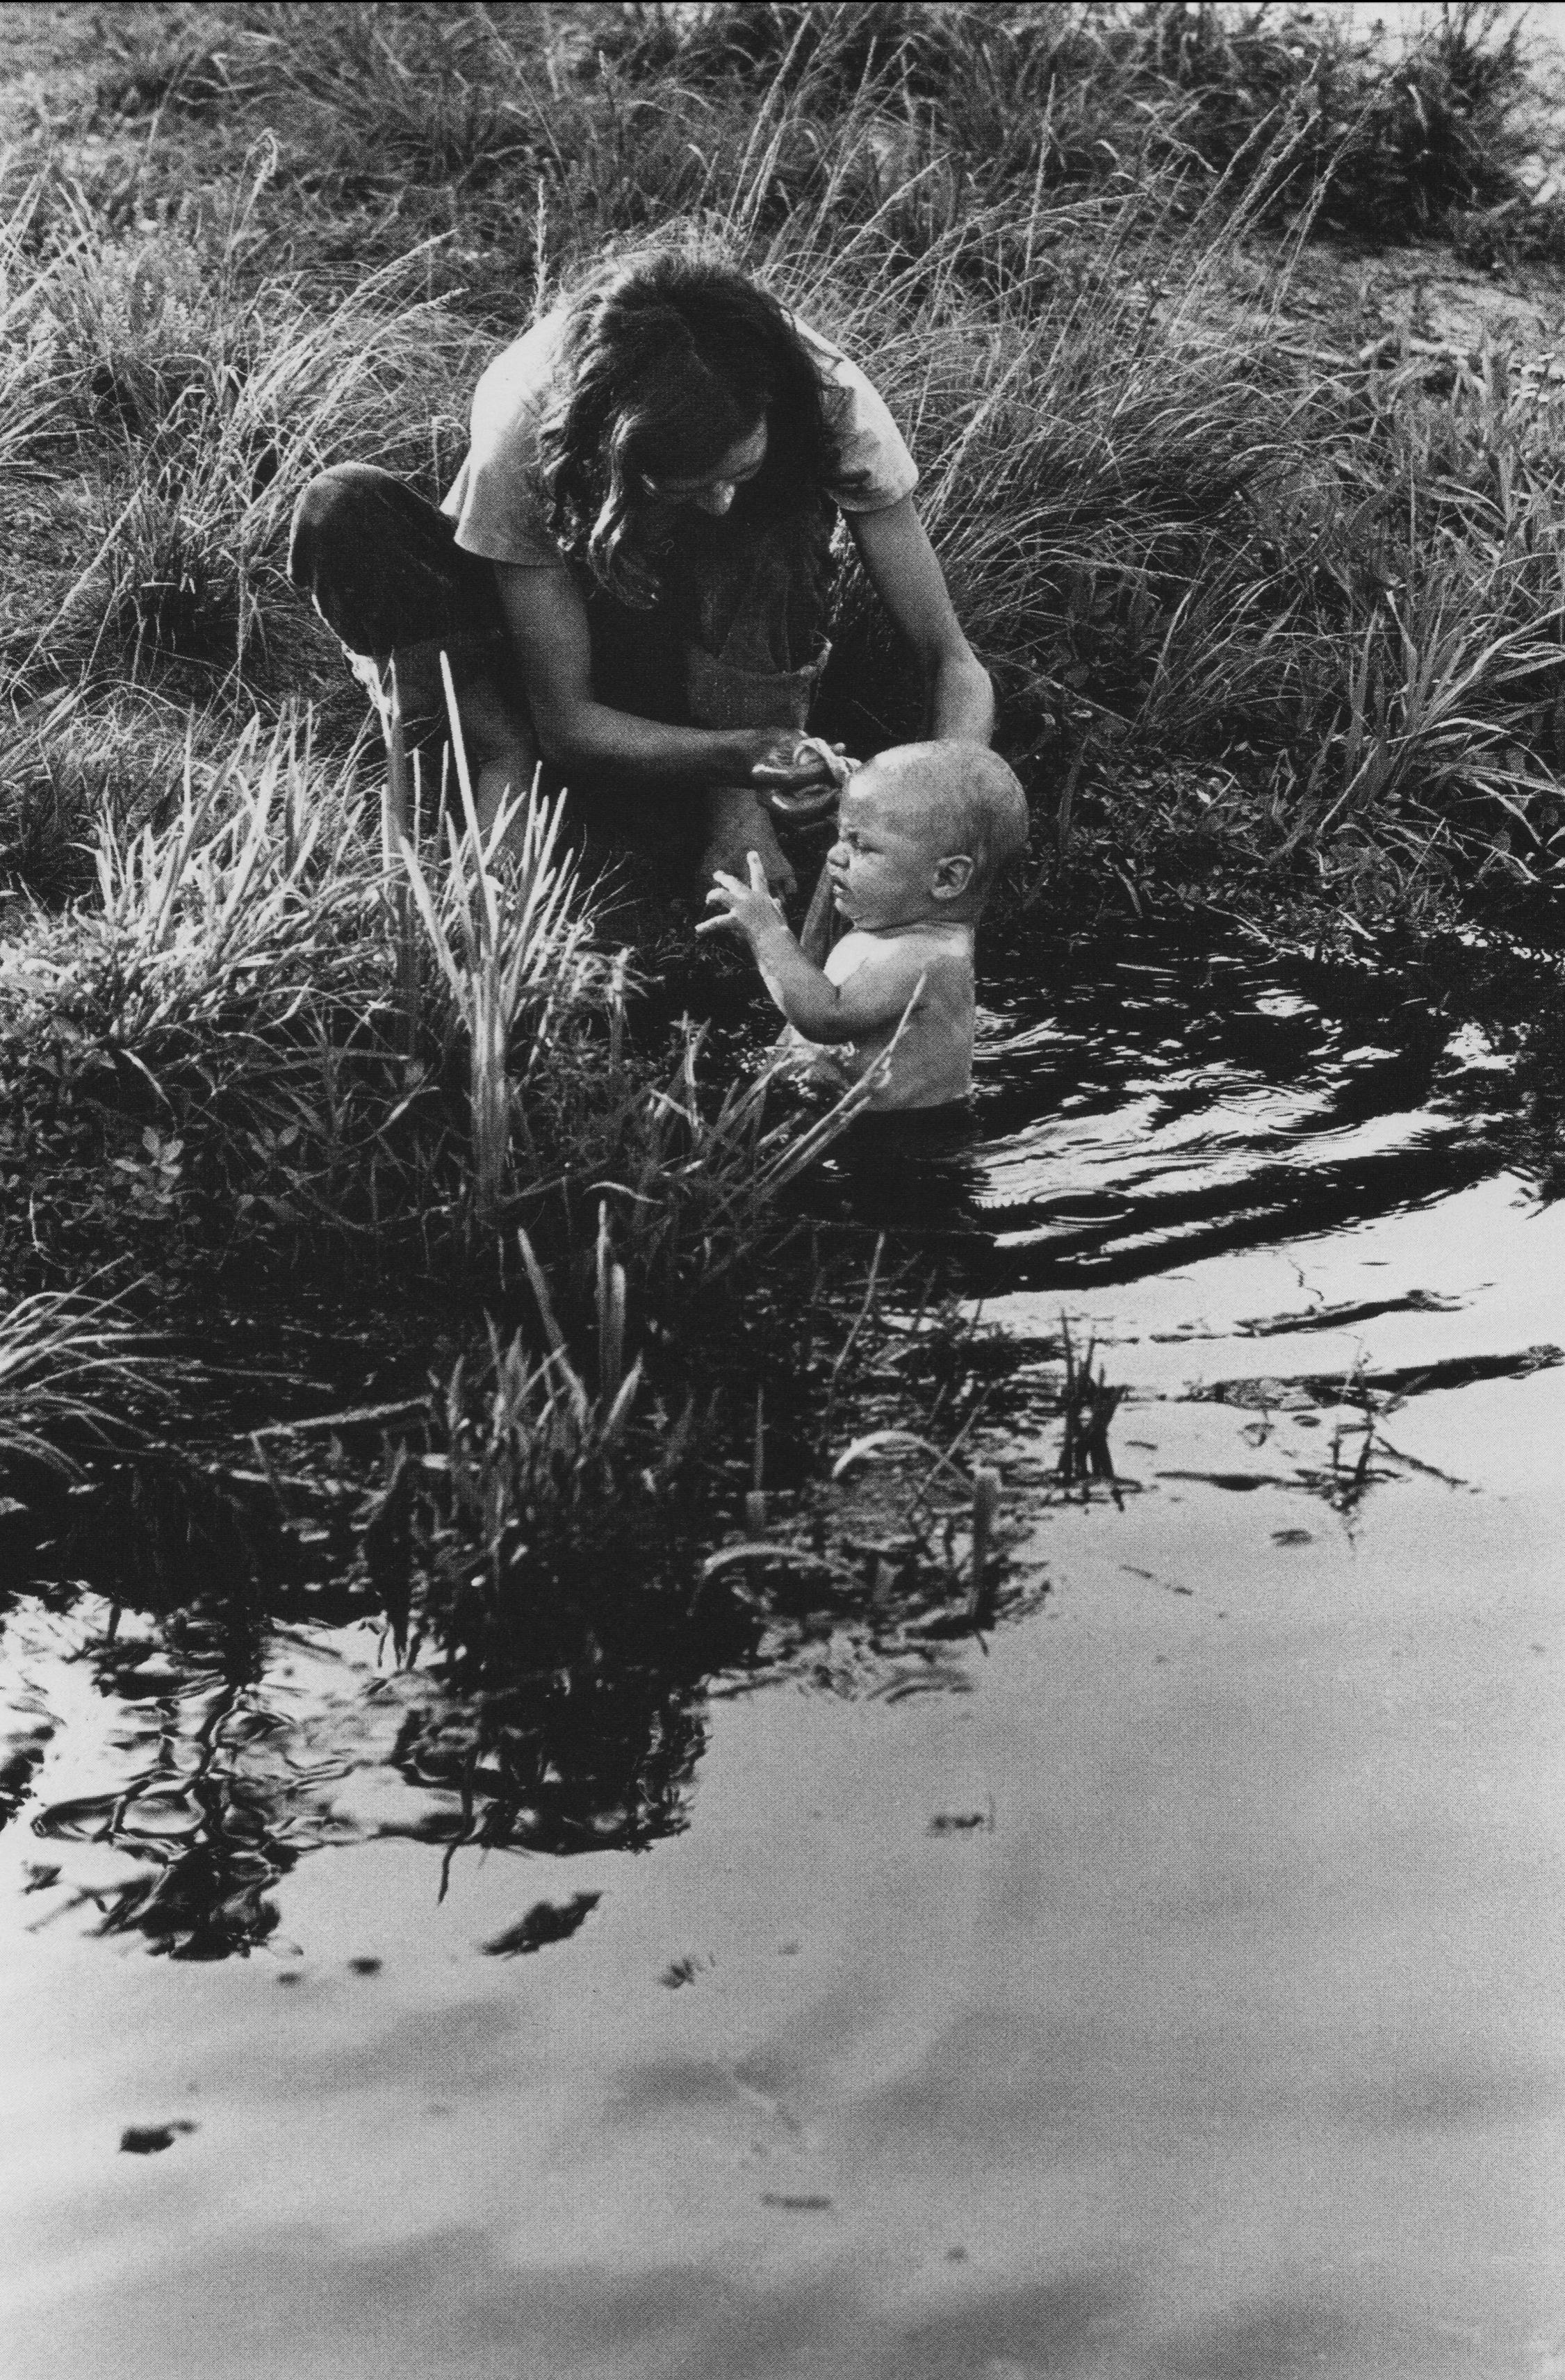 Linda bathing Shannon in irrigation canal, Loxahatchee, FL